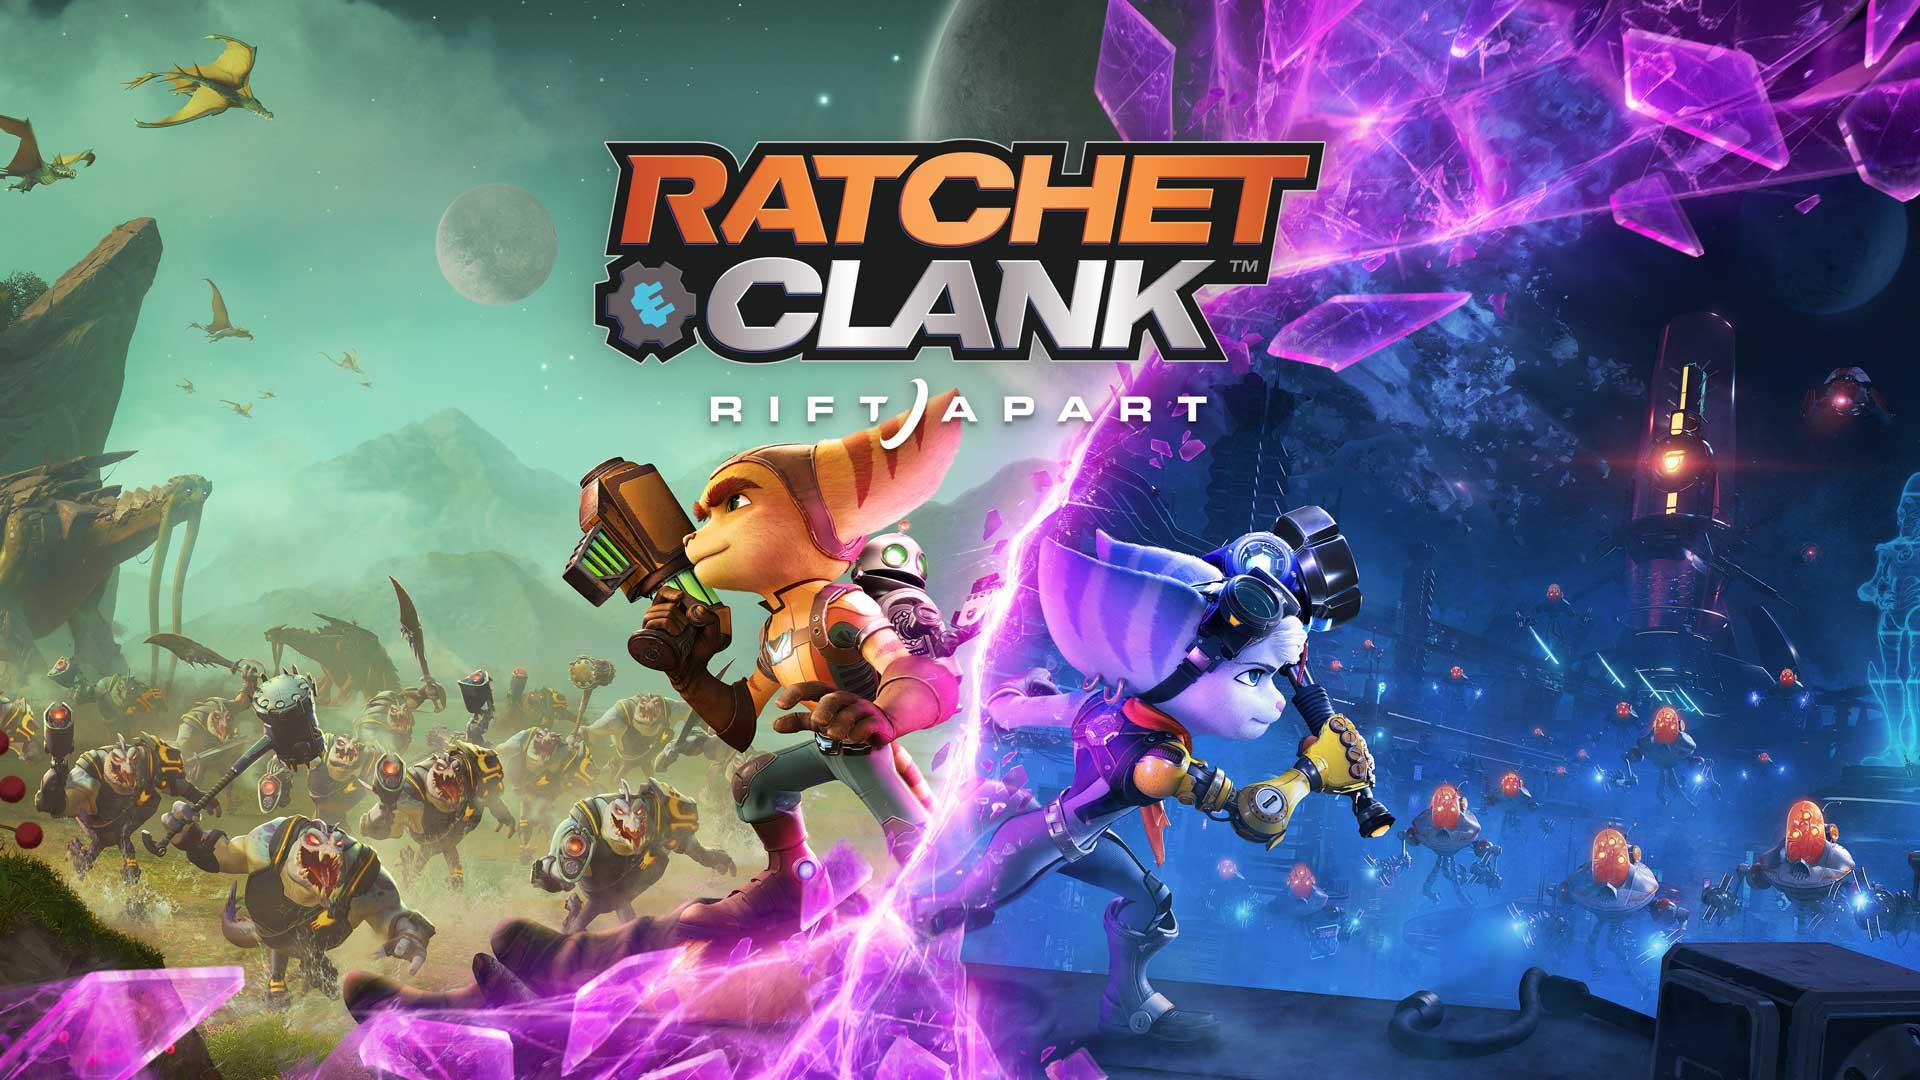 PS5 Ratchet and Clank: A Rift Apart Ratchet and Clank: Rift Apart Platinum Trophy Haptic Feedback DualSense